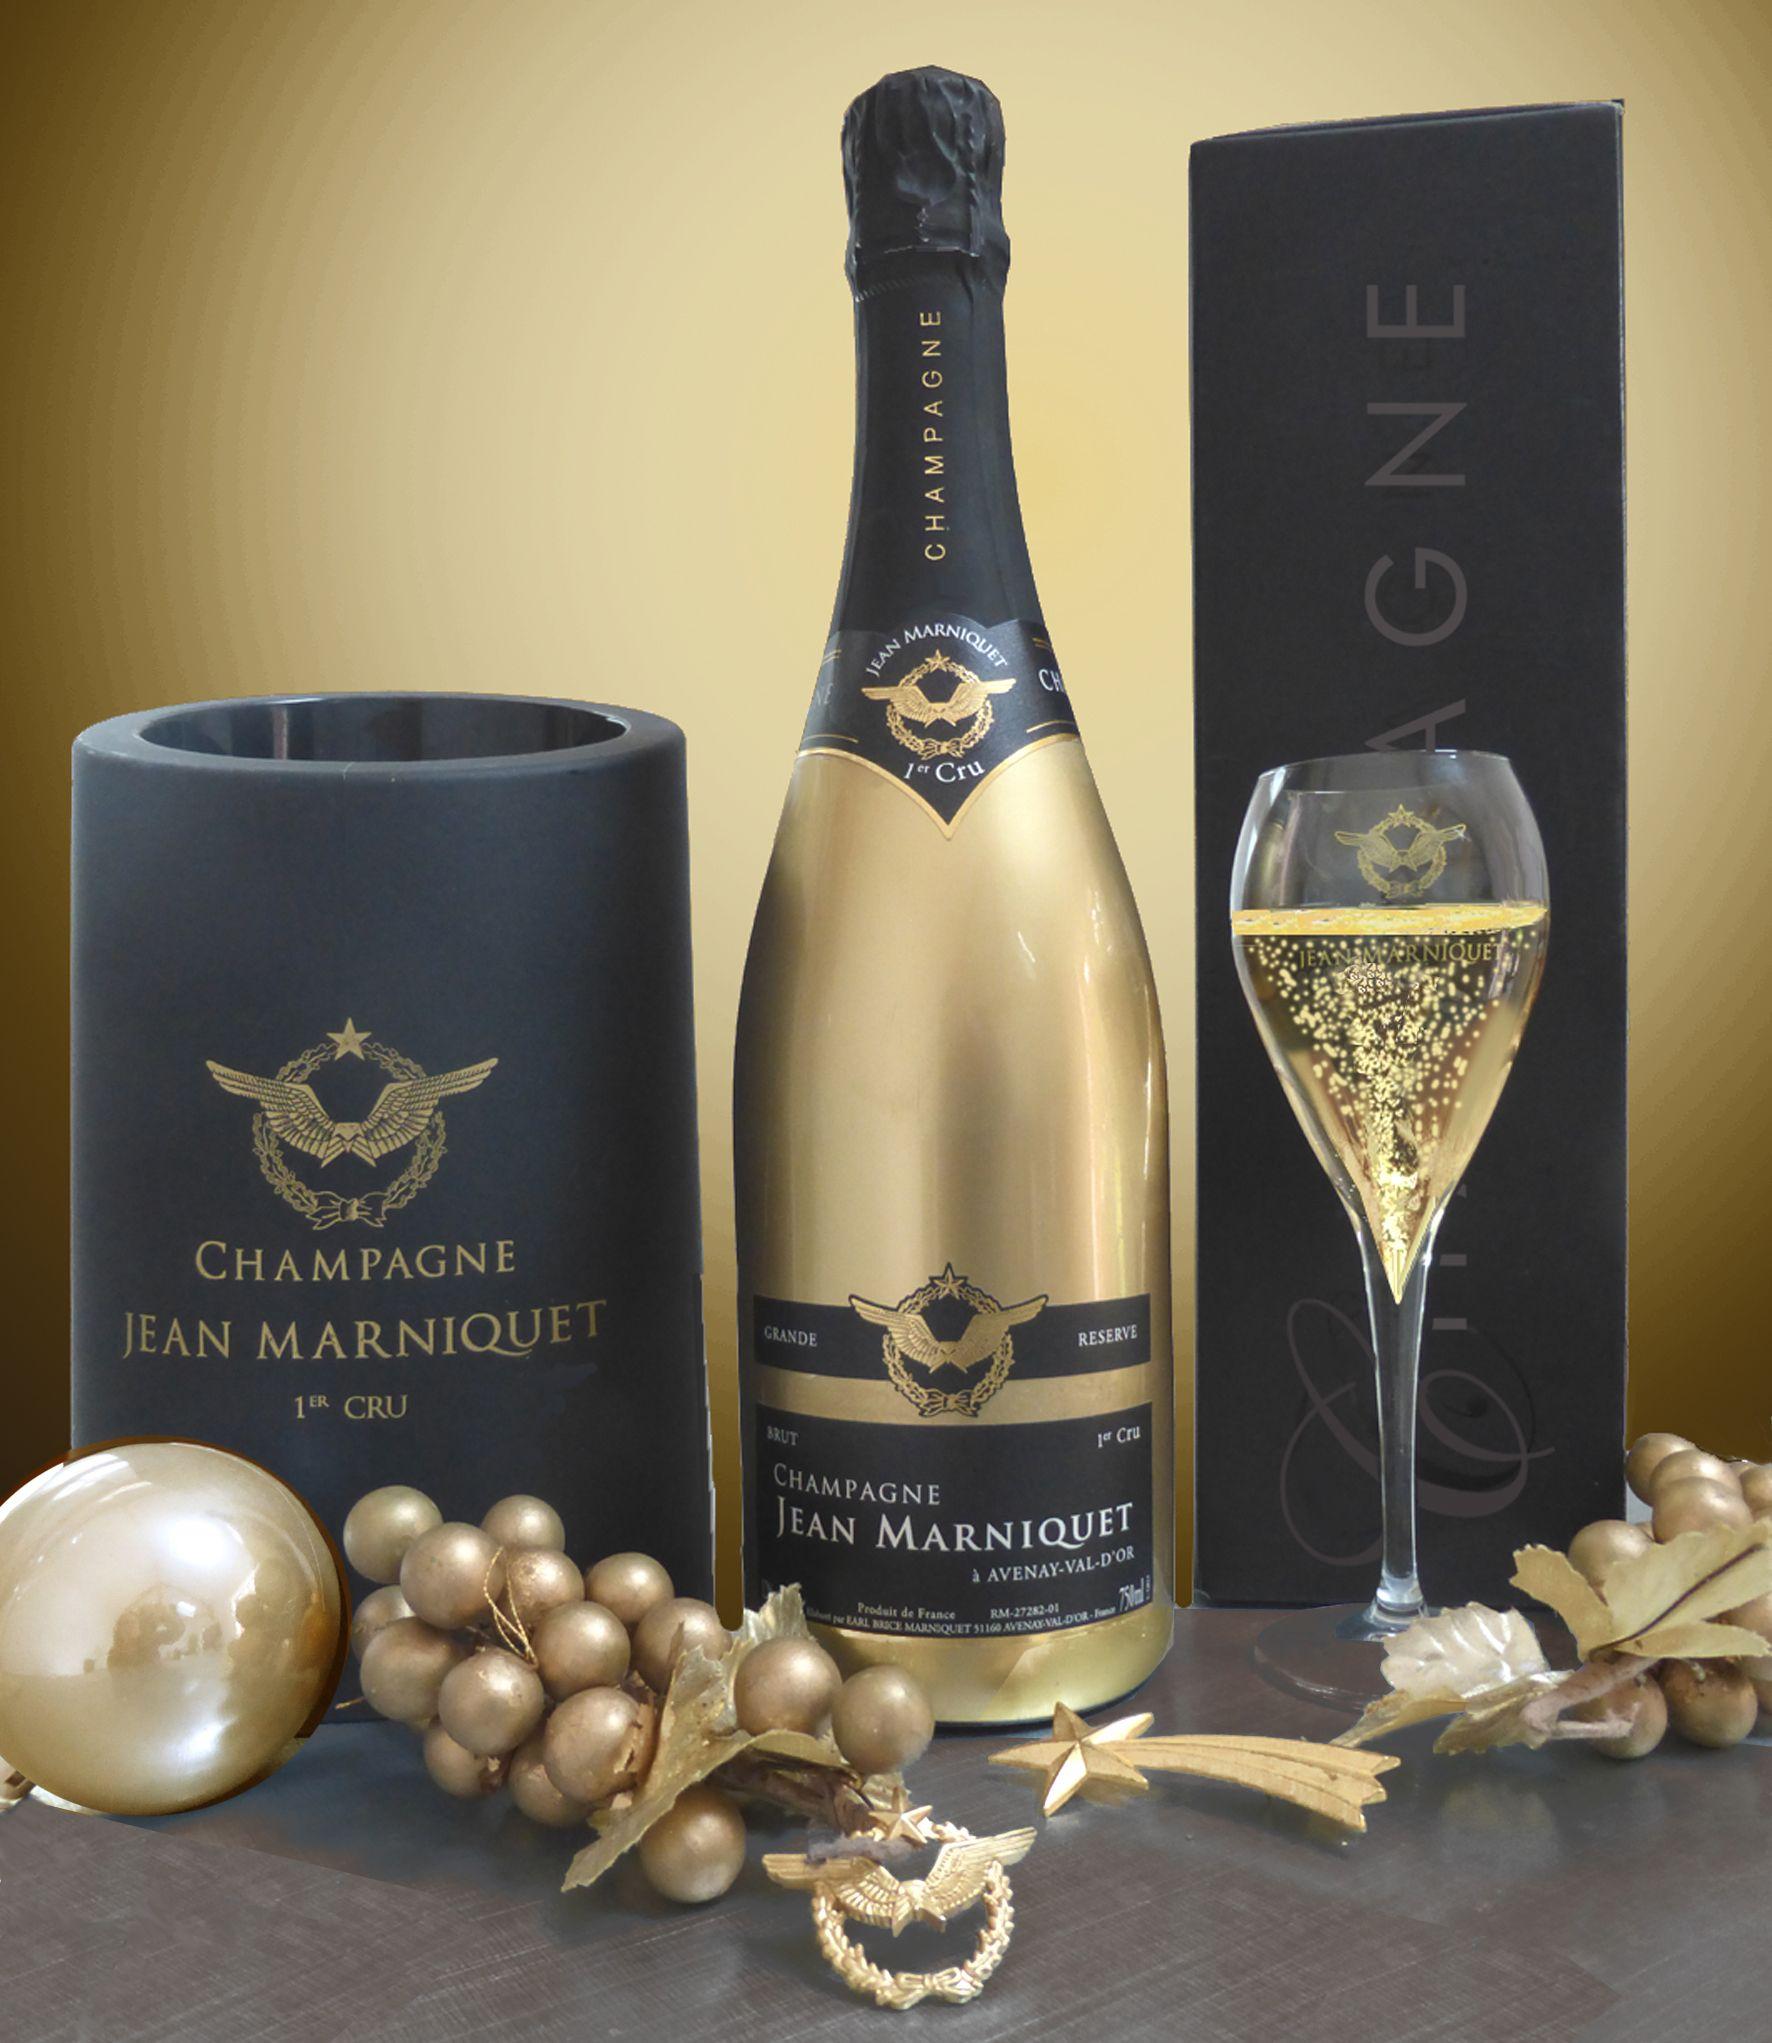 Champagne Jean Marniquet En 2020 Champagne Champagne Ardenne Et